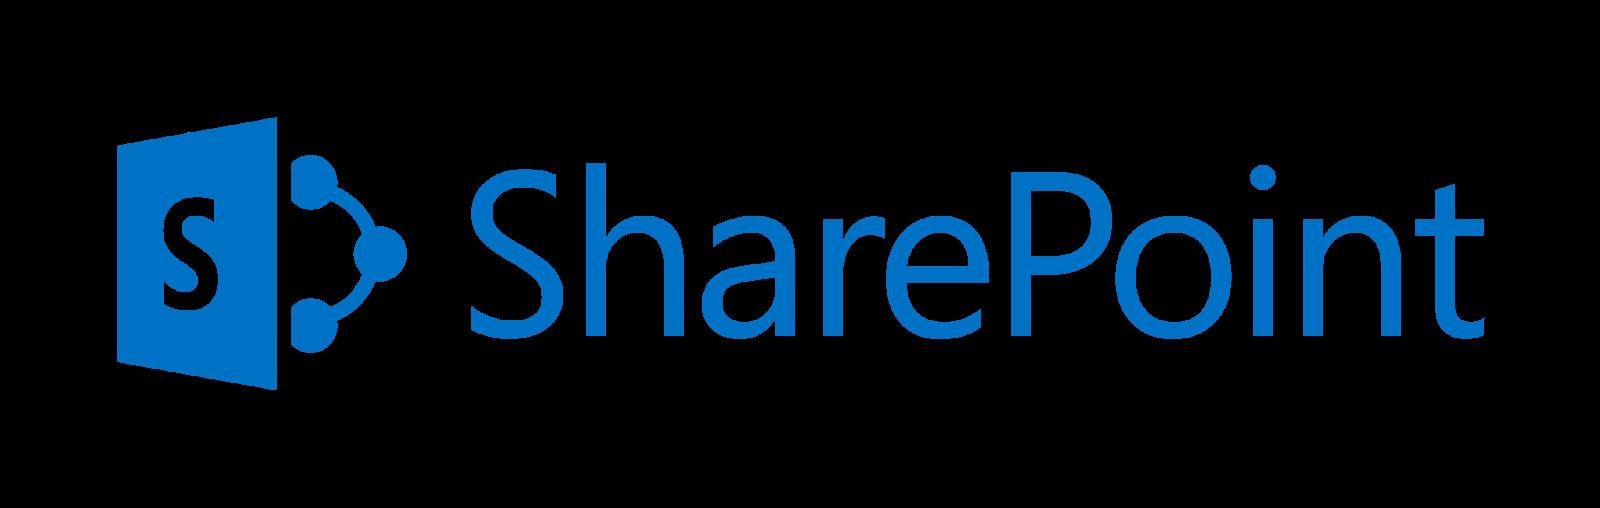 sharepoint 2013 hosting